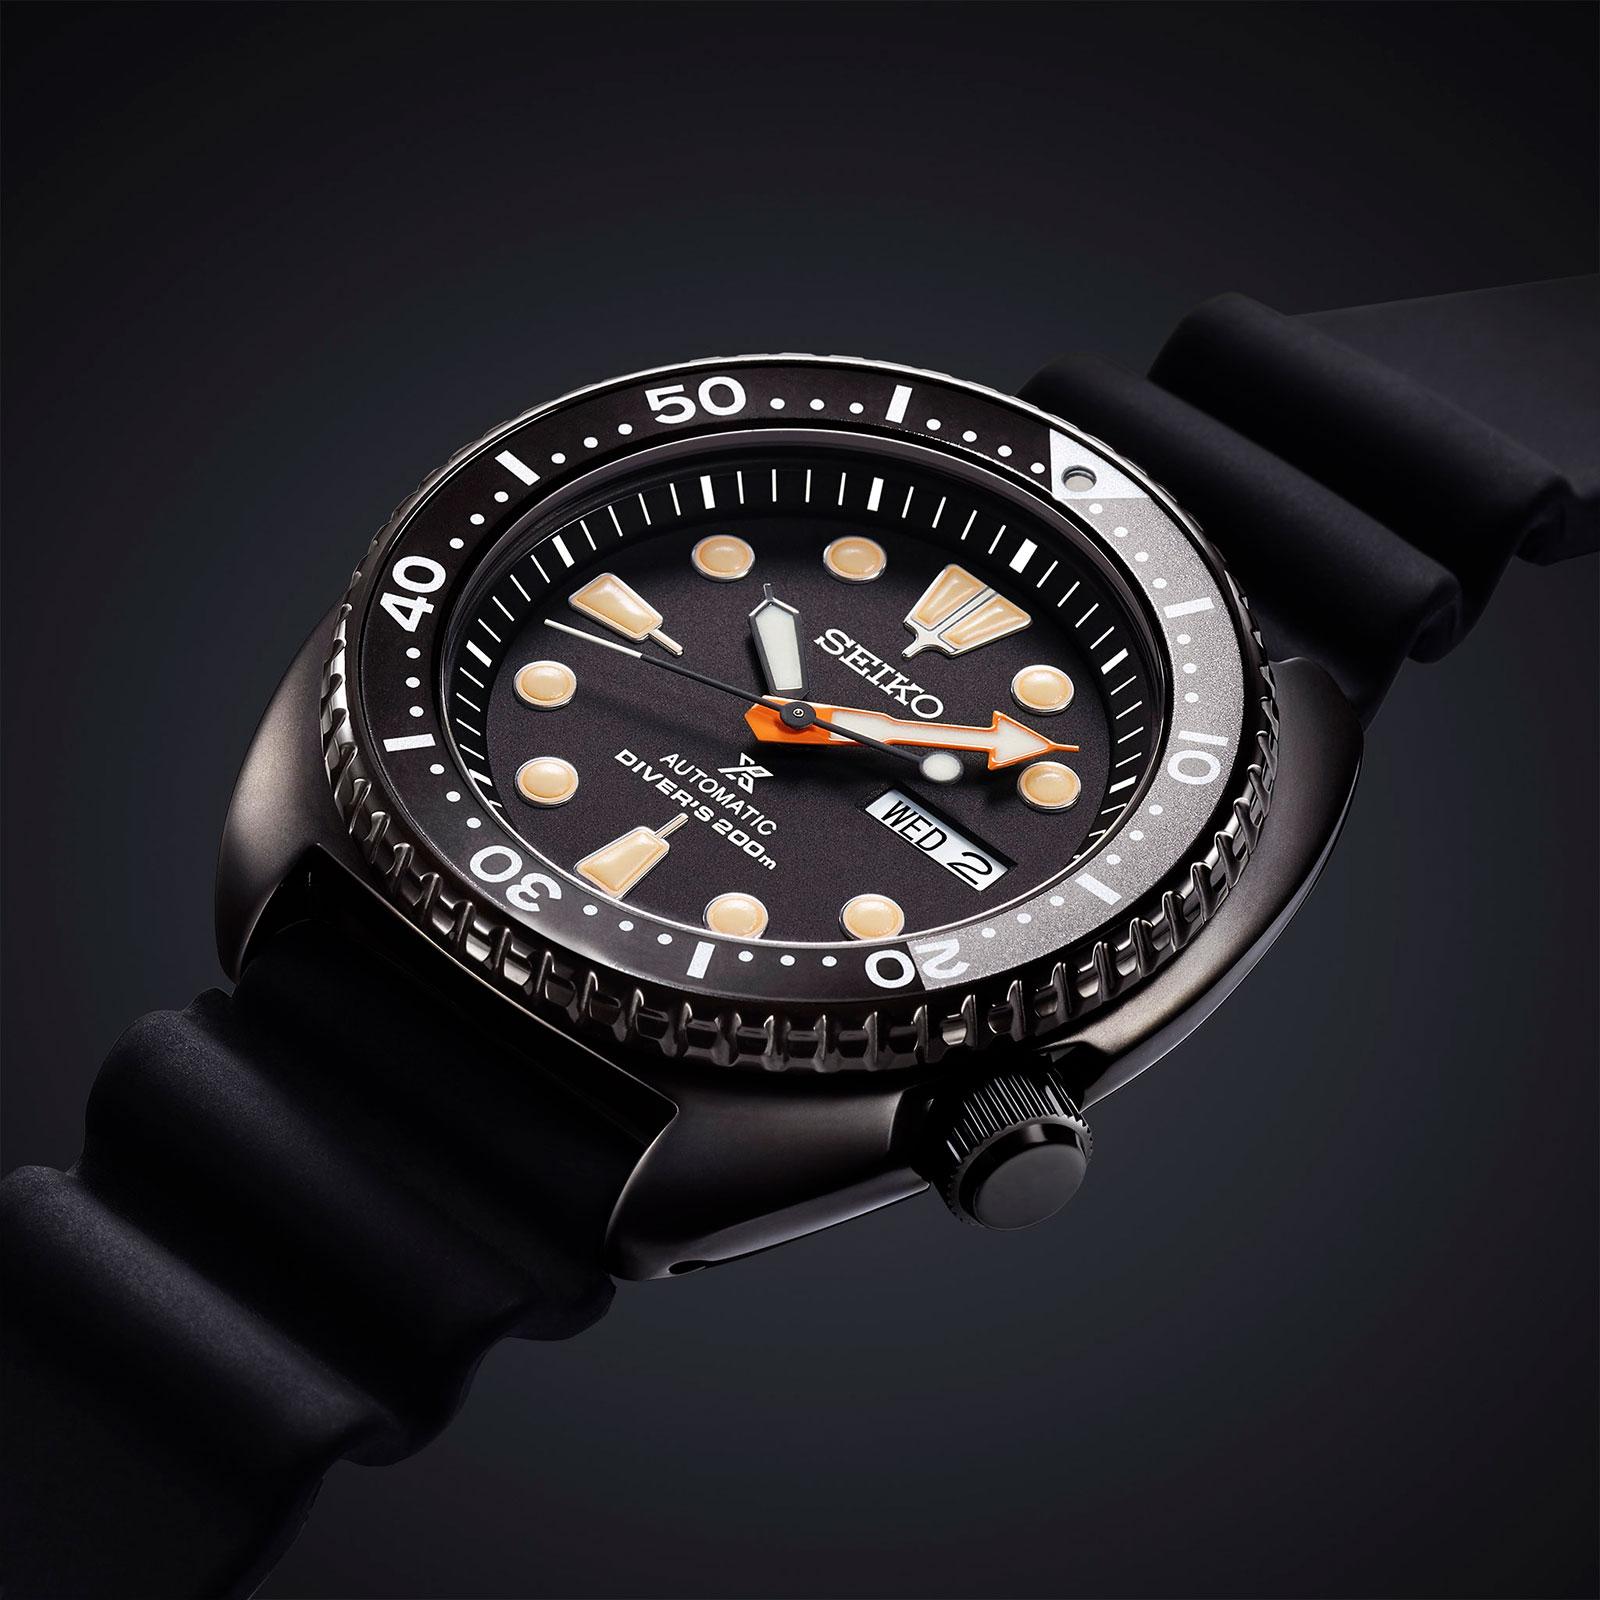 Seiko Prospex Black Series SRPC49